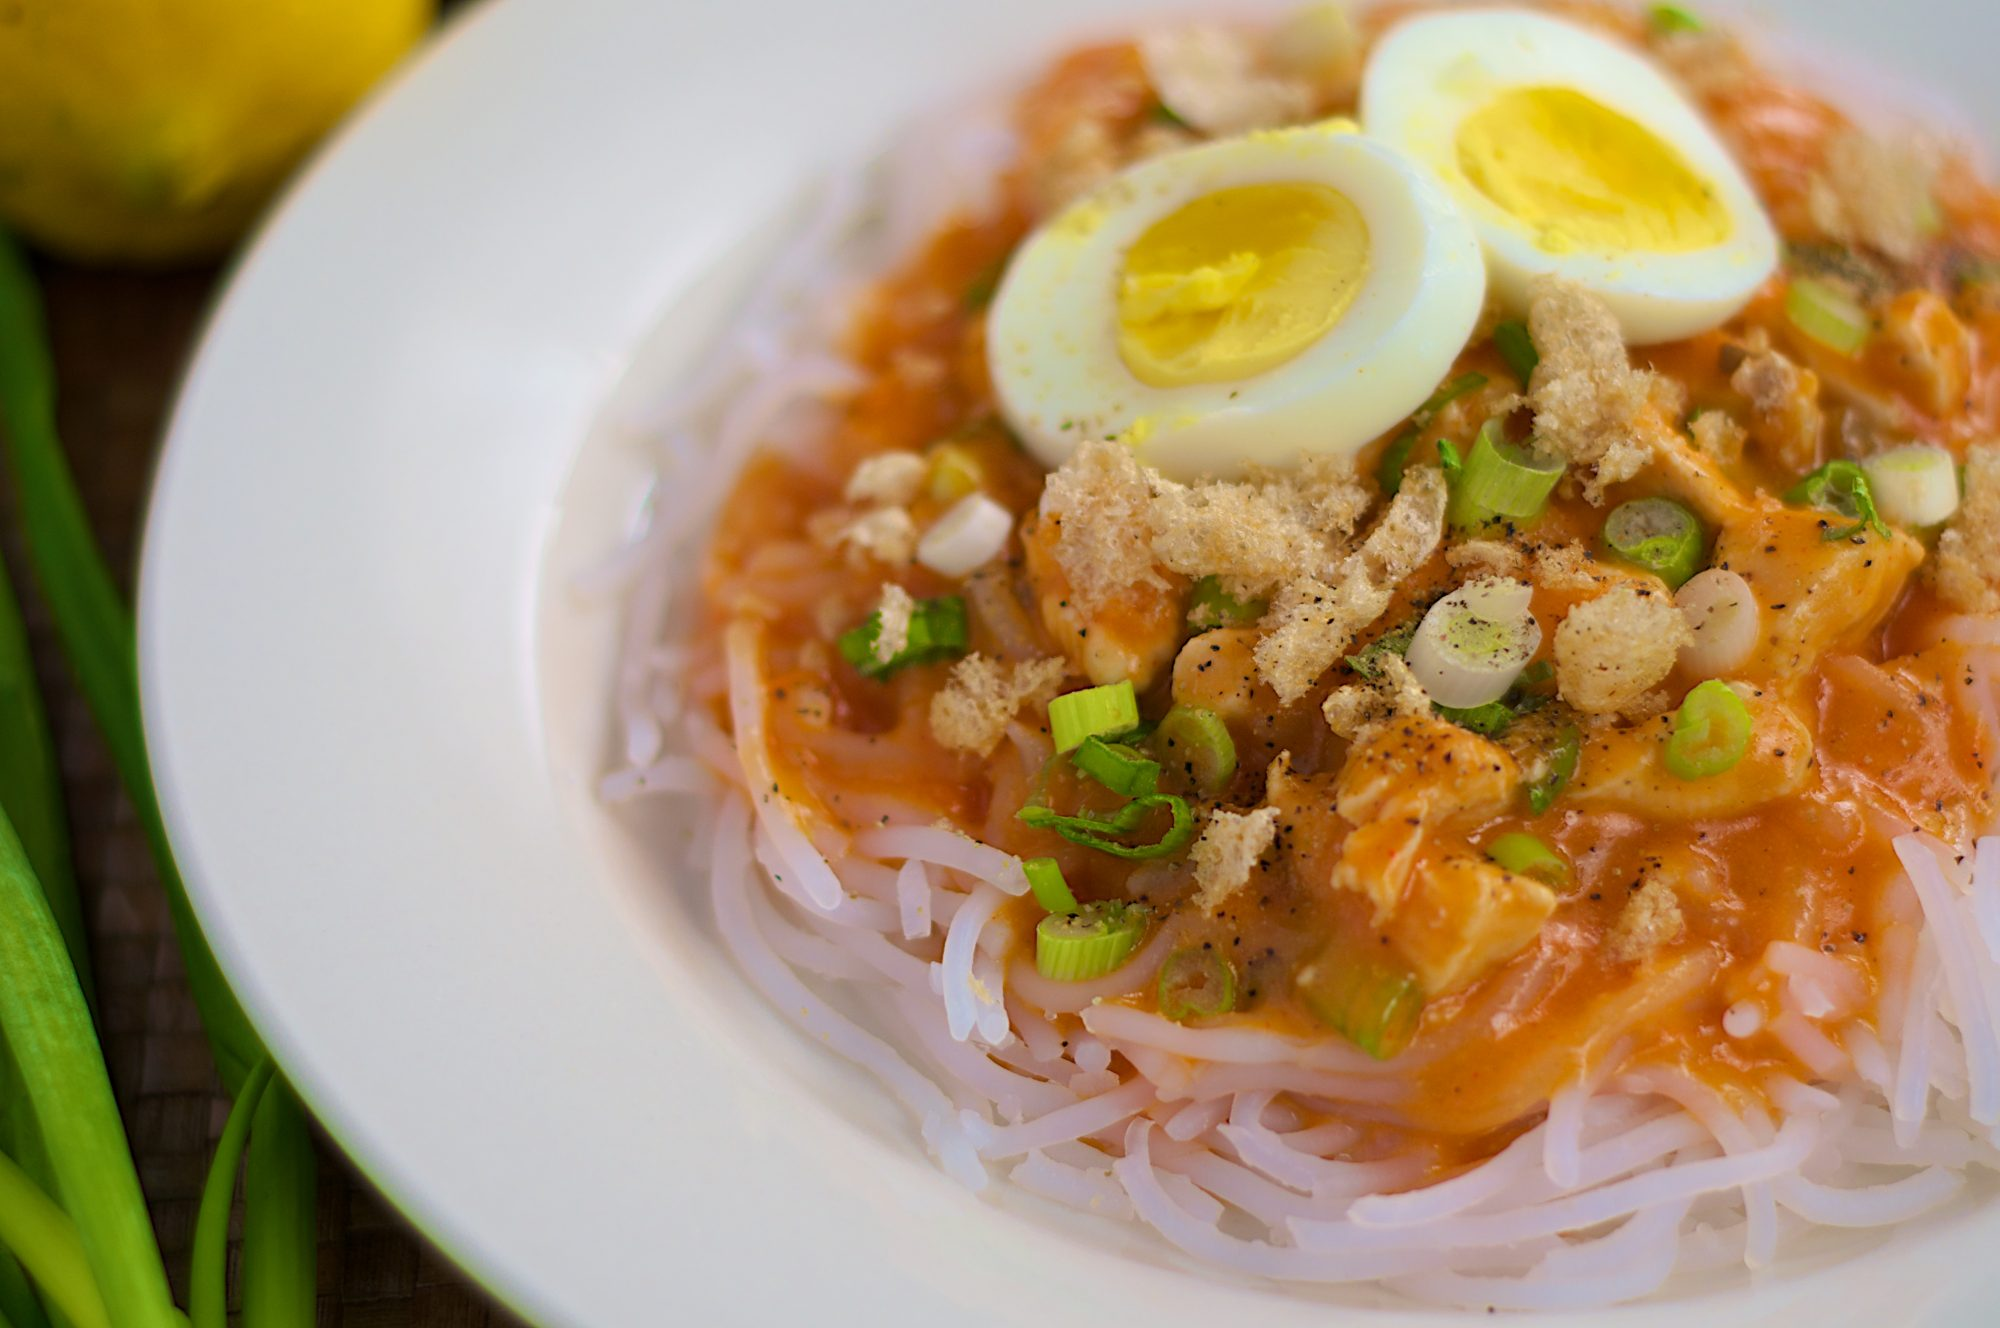 filipina-food-crawl-4.jpg